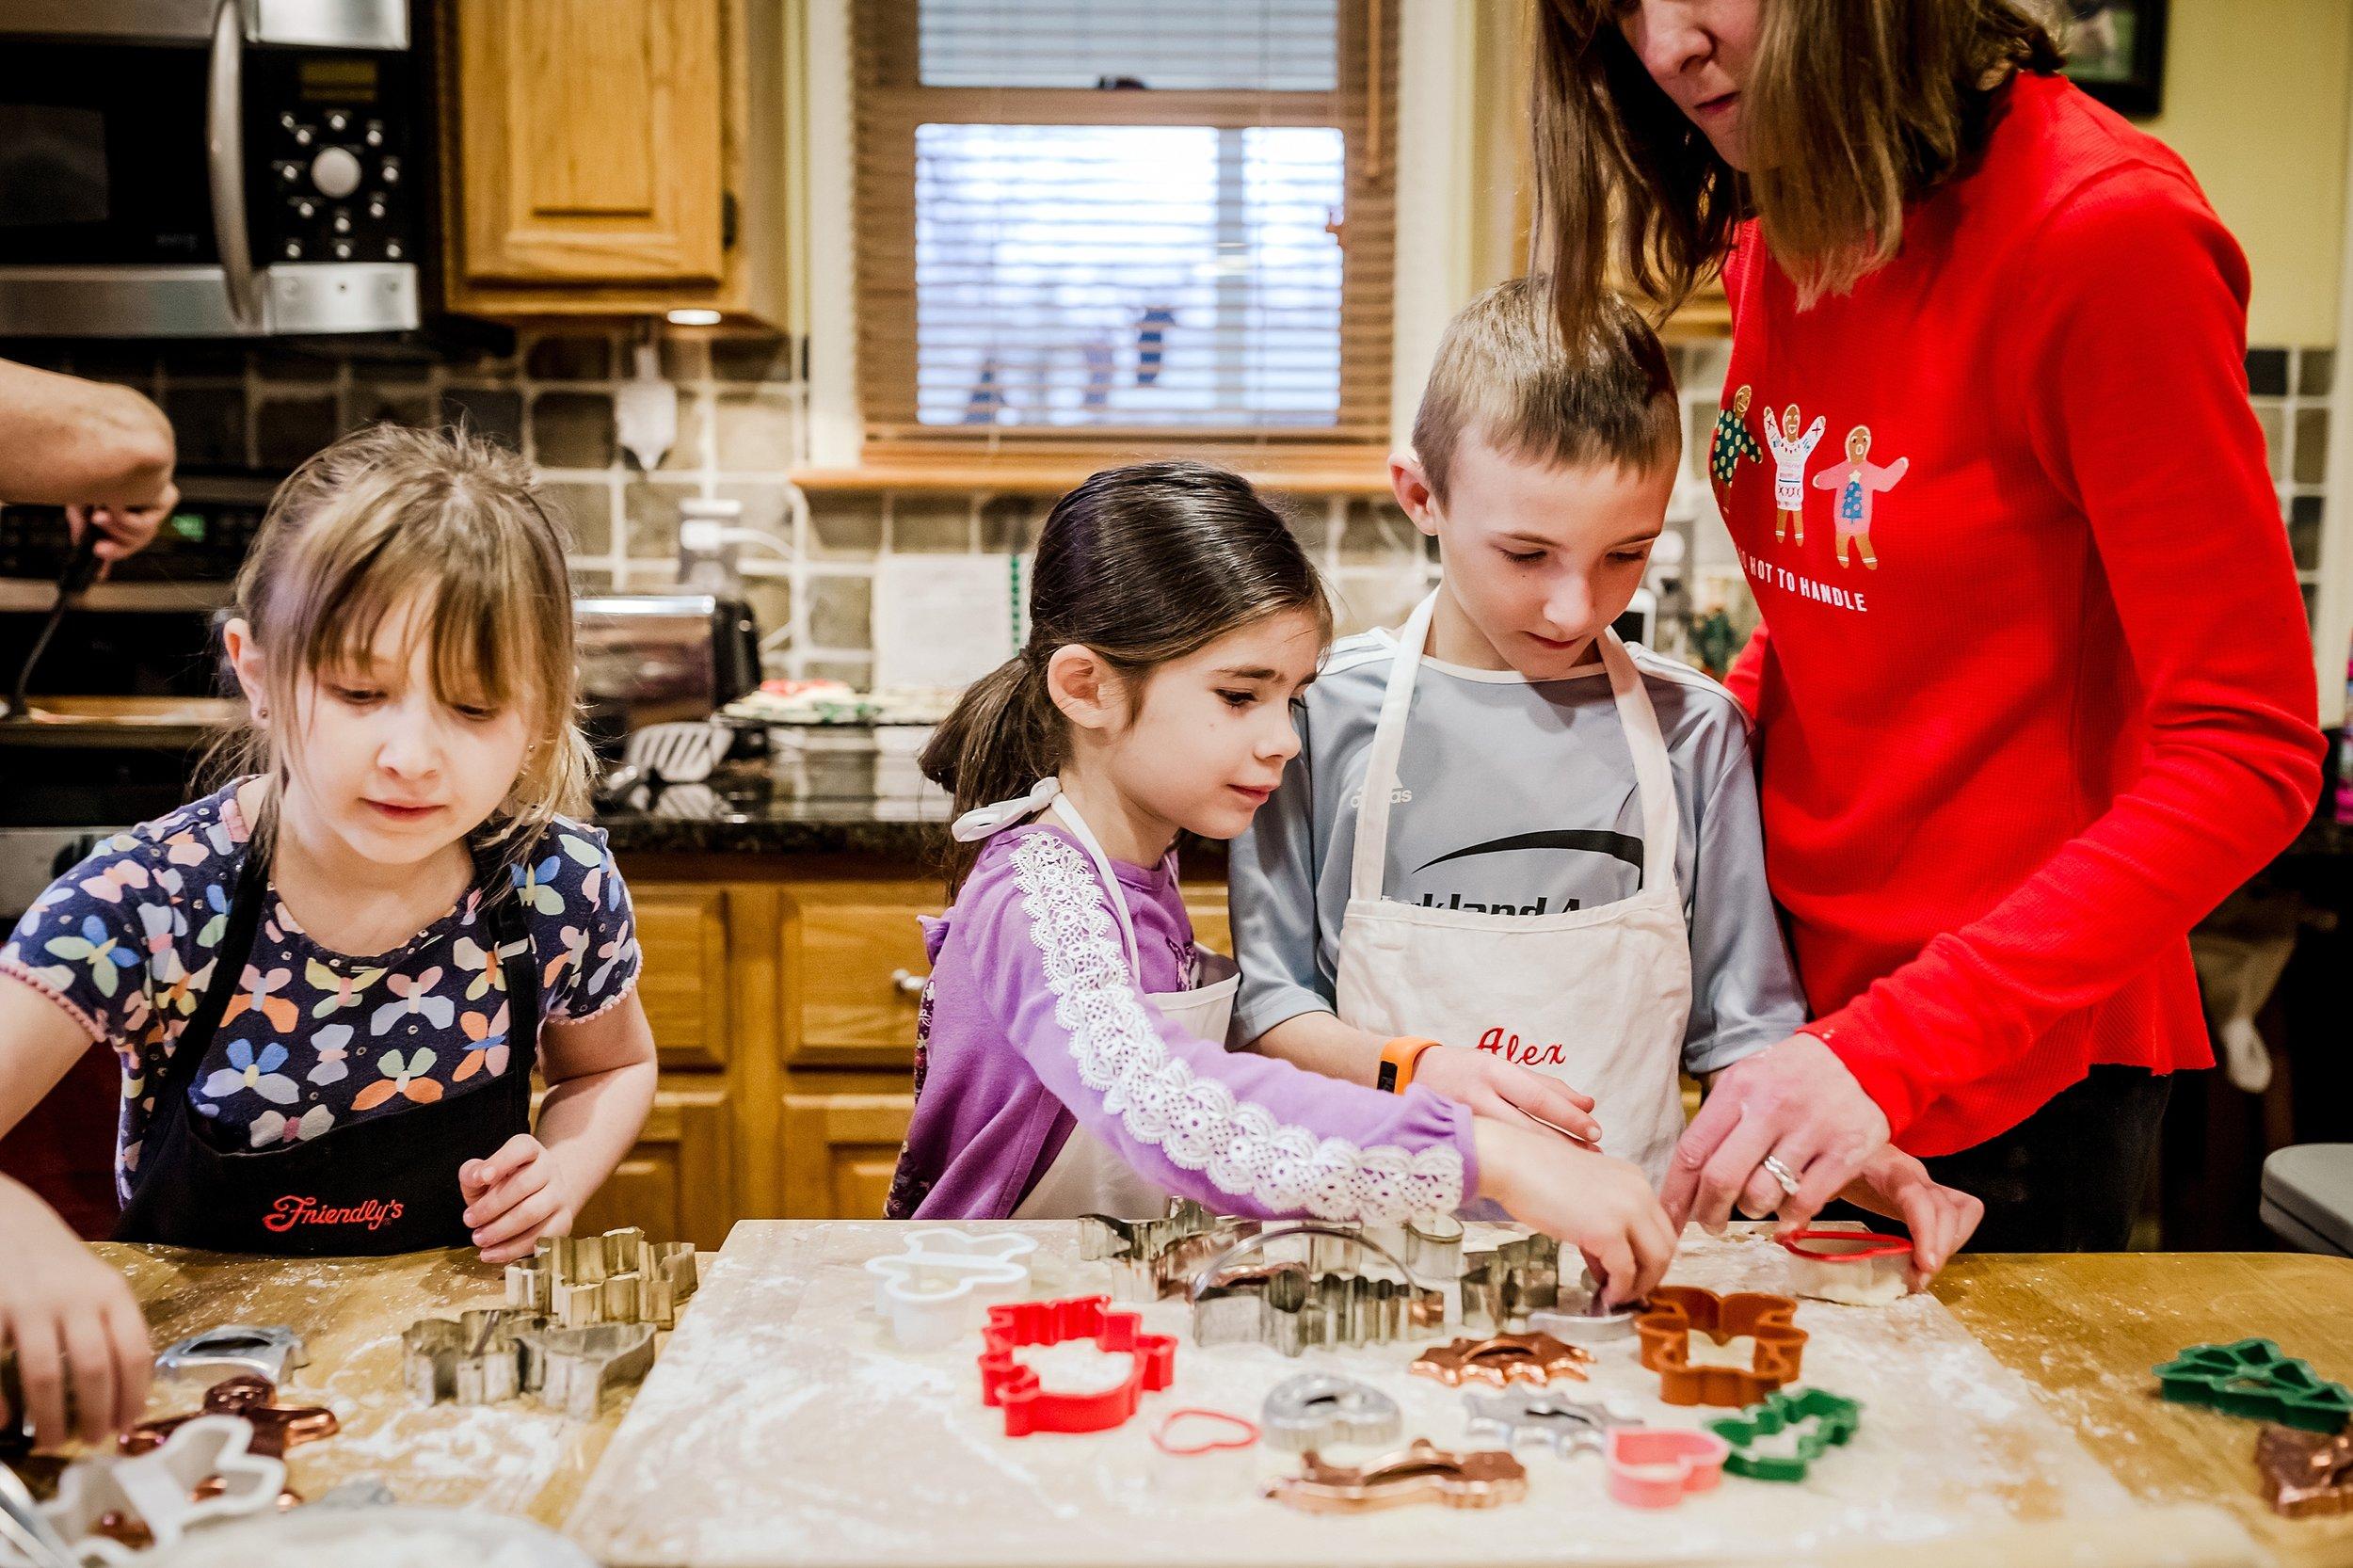 Lehigh-Valley-In-Home-Family-Photographer_0004.jpg